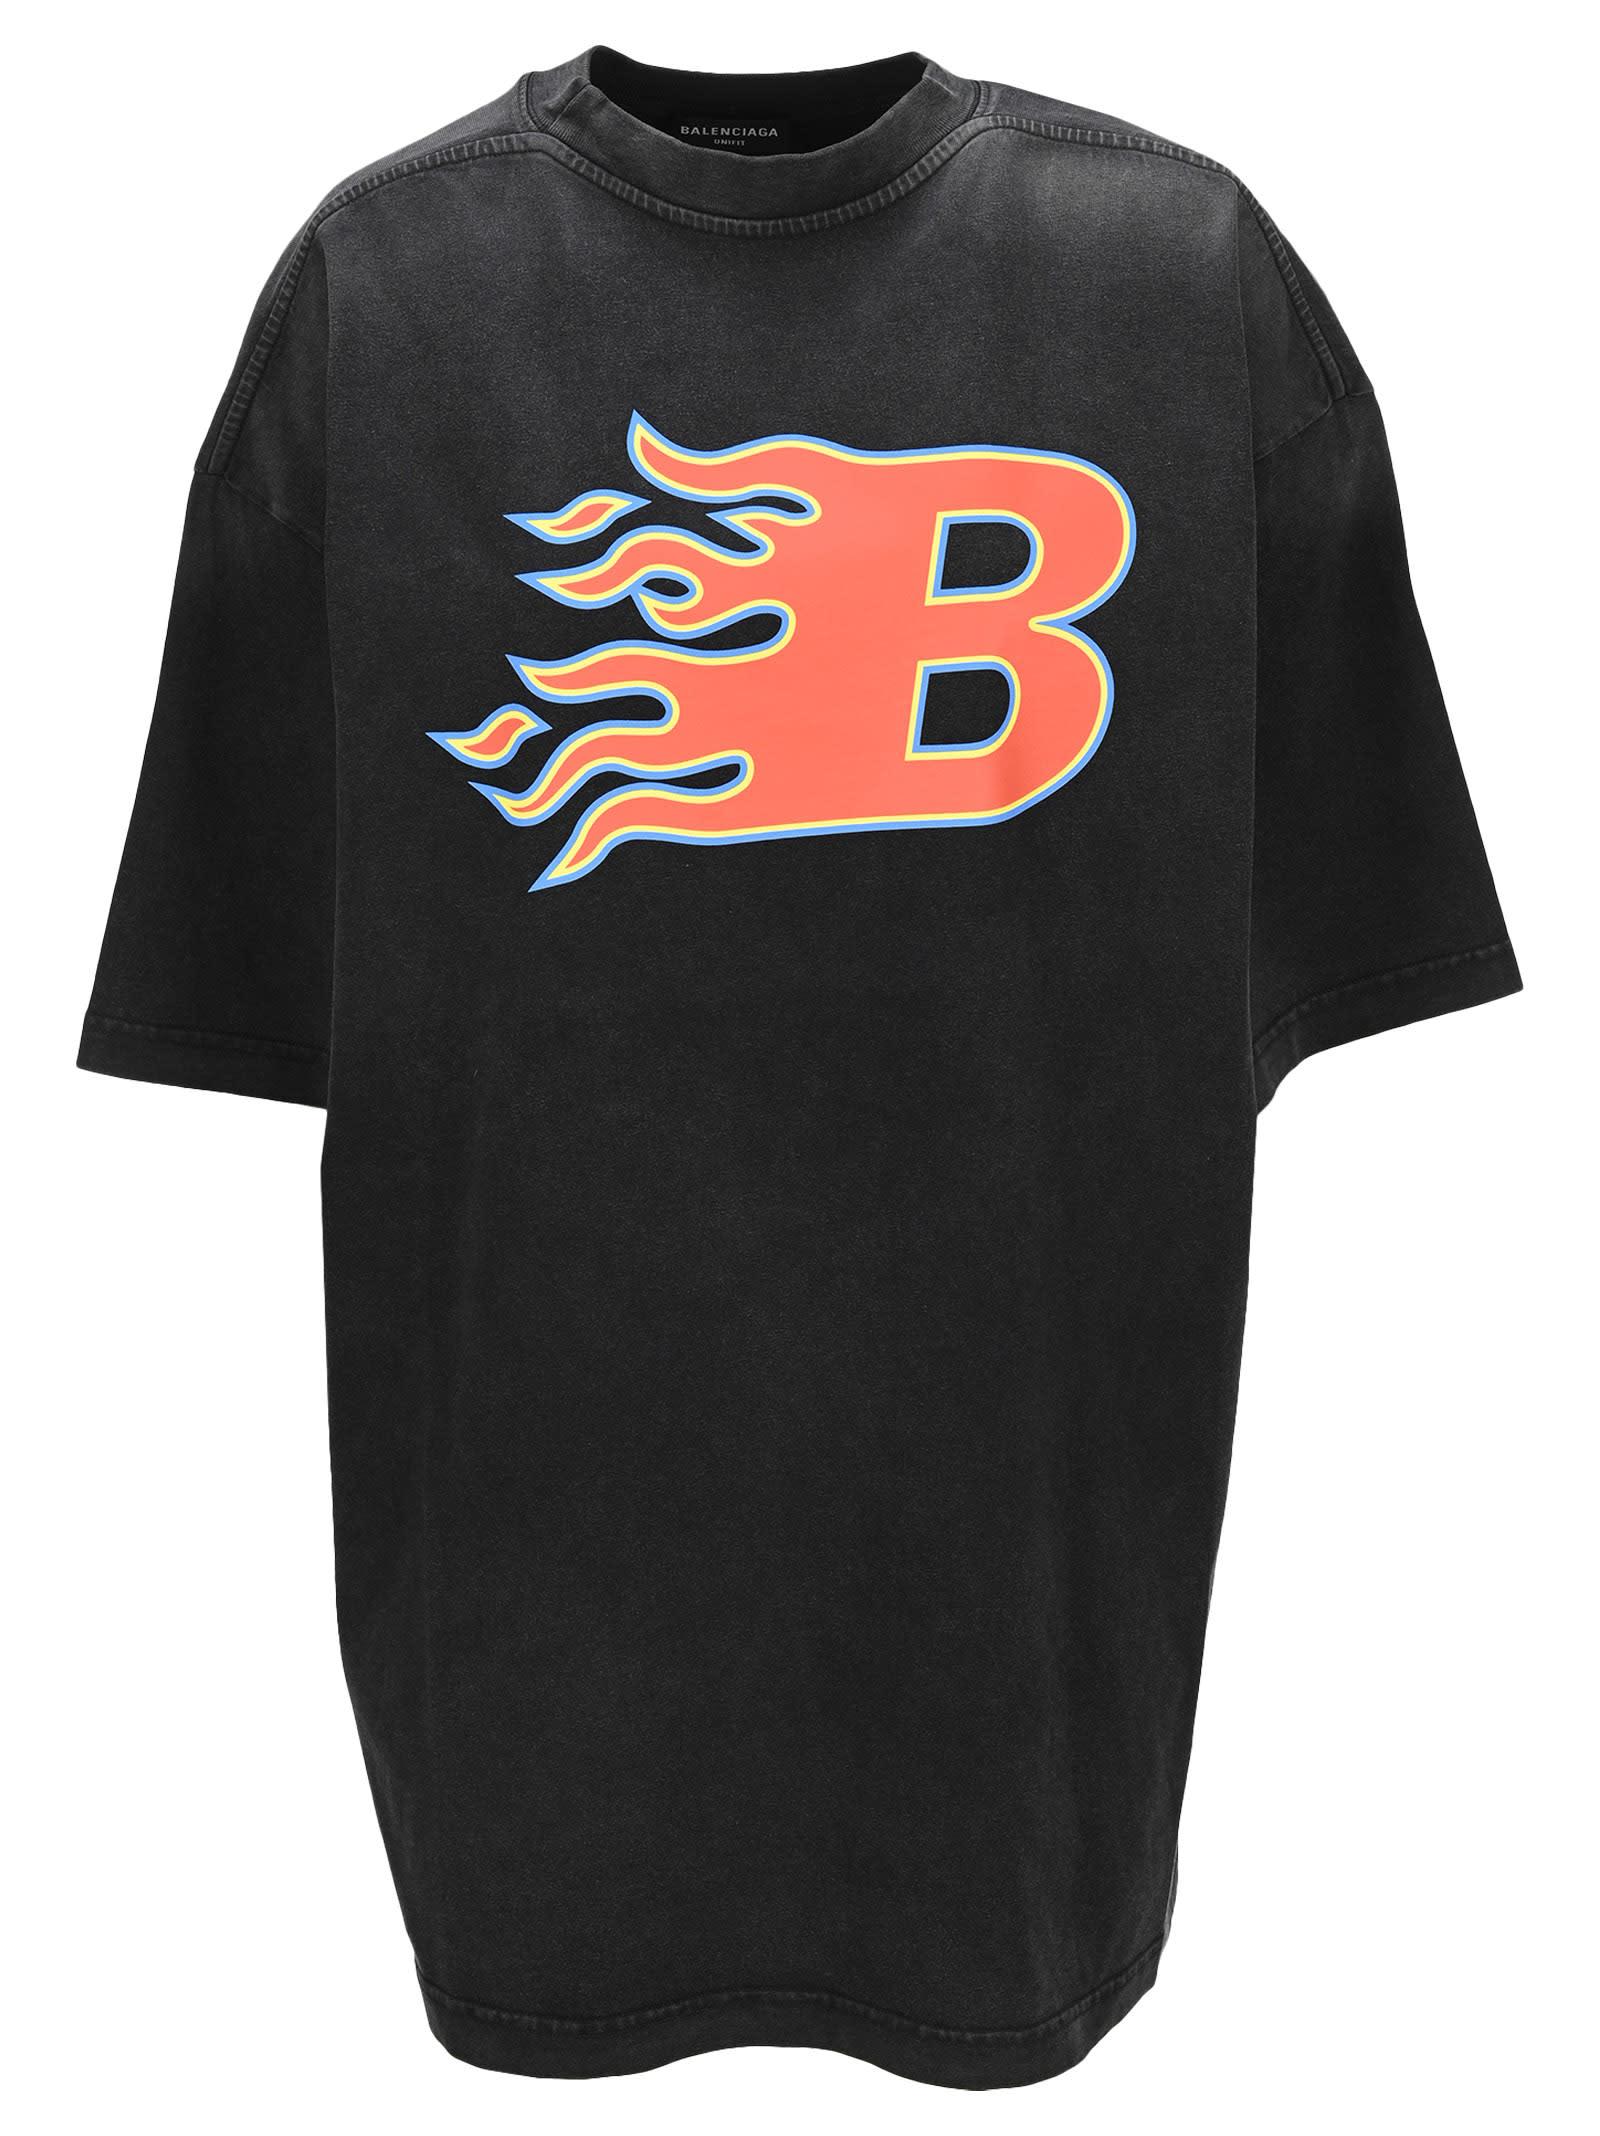 Balenciaga T-shirts OVERSIZED FLAME T-SHIRT